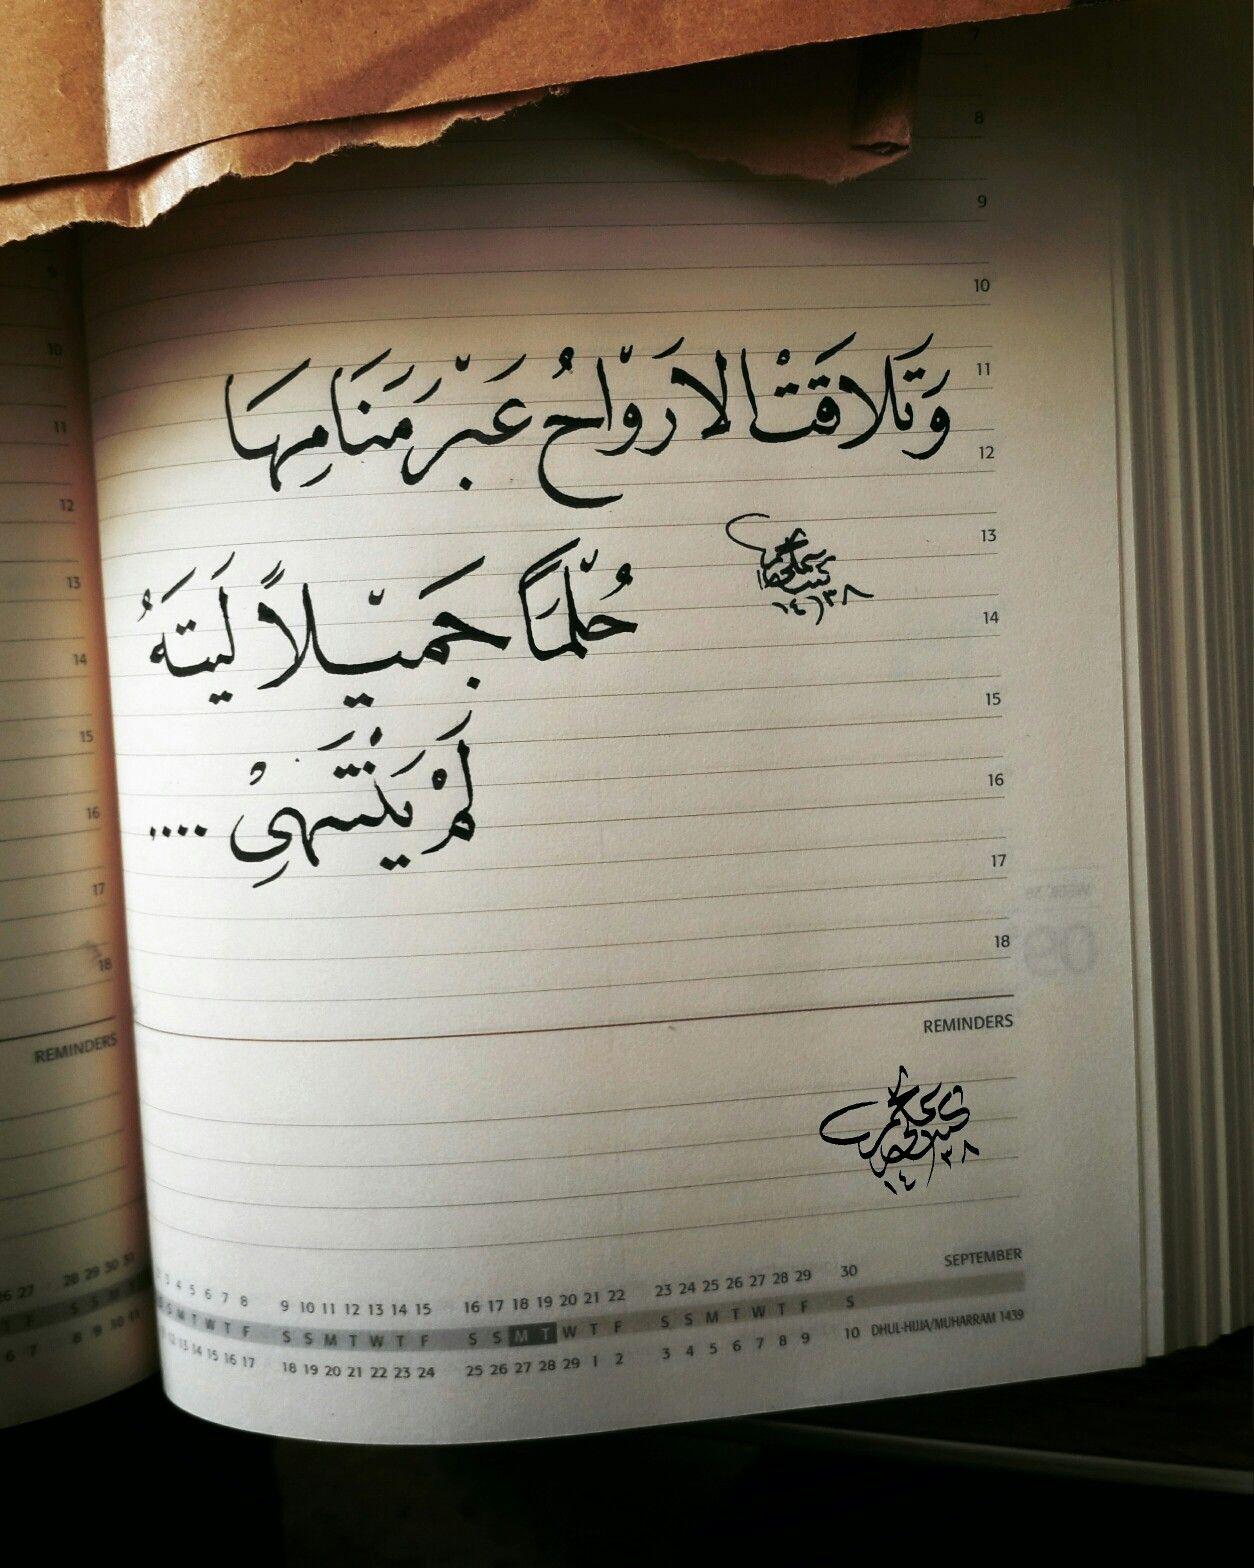 و تلاقت الأرواح عبر منامها خطي نسخ اقتباسات Words Quotes Arabic Love Quotes Romantic Love Quotes